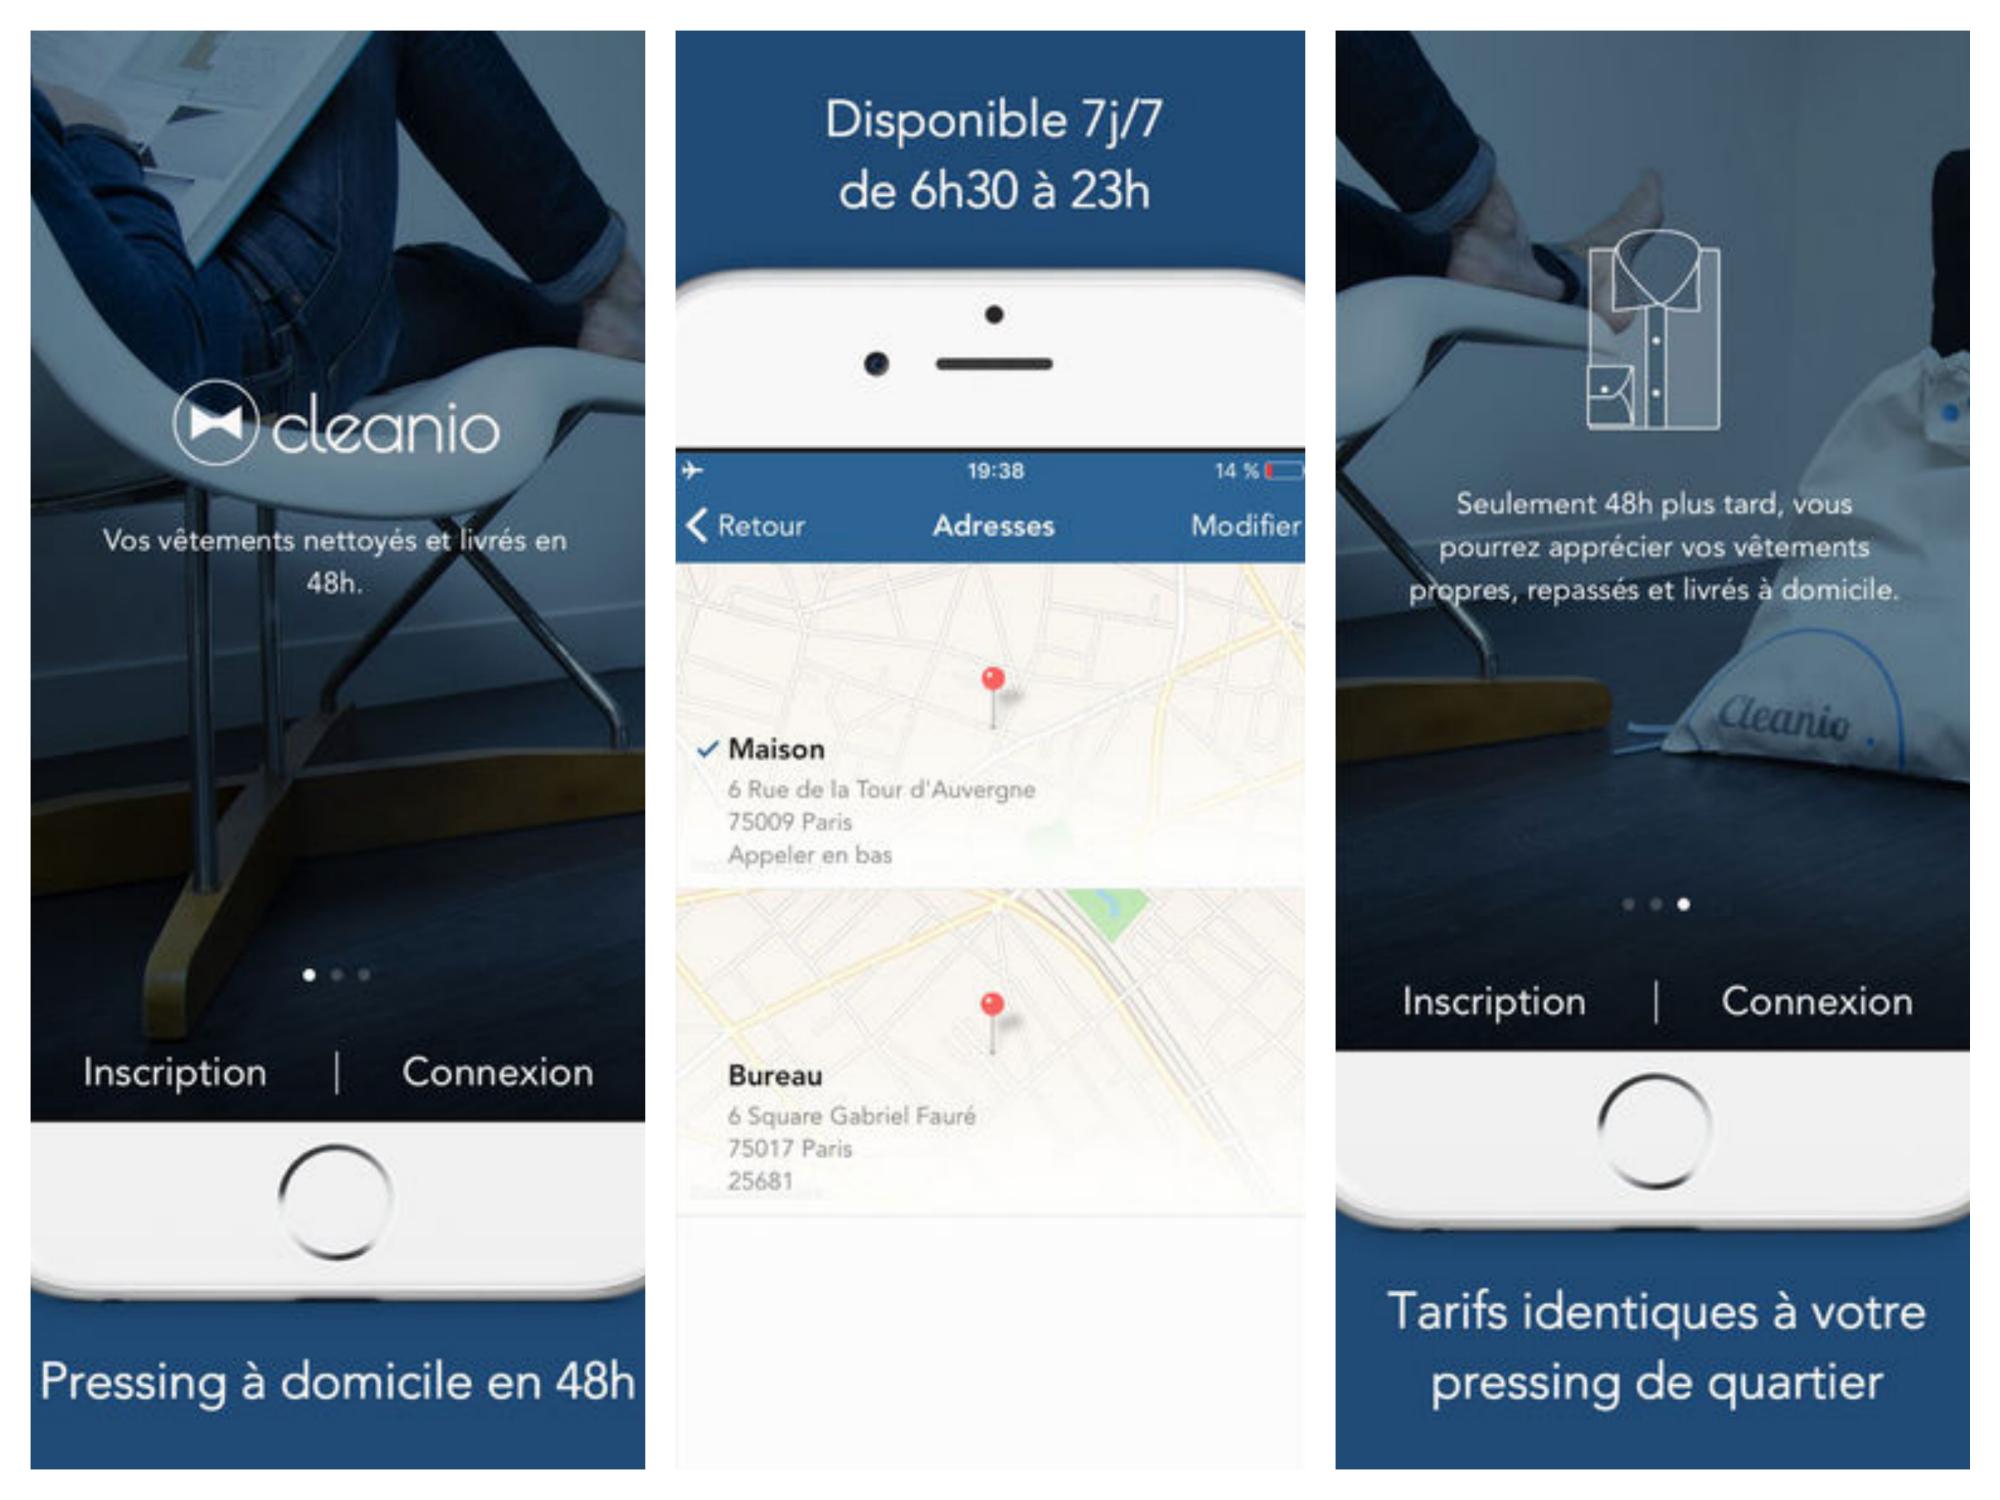 cleanio pressing domicile code promo blog avis revue test application